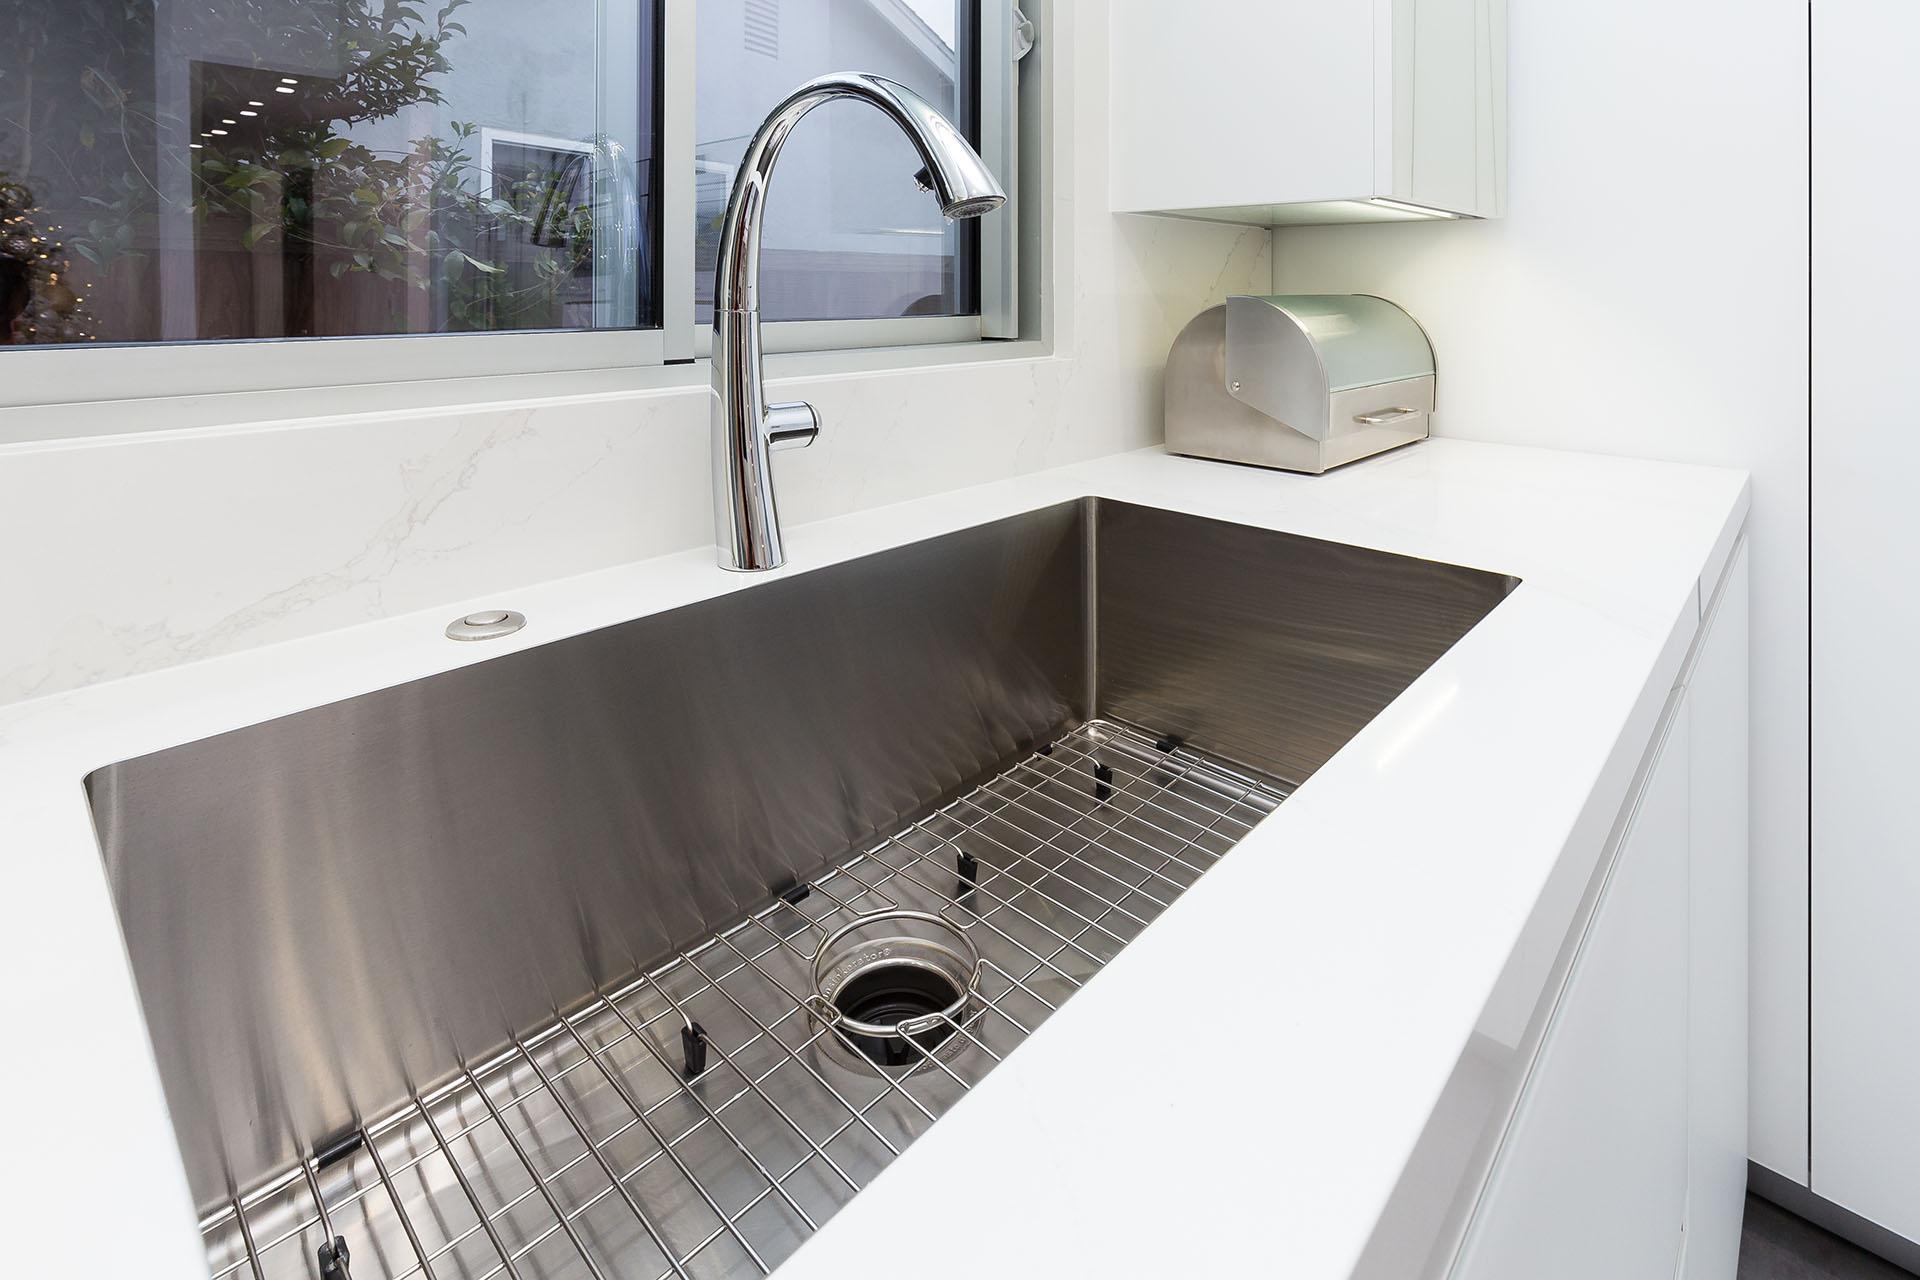 TopZero rimless kitchen sink